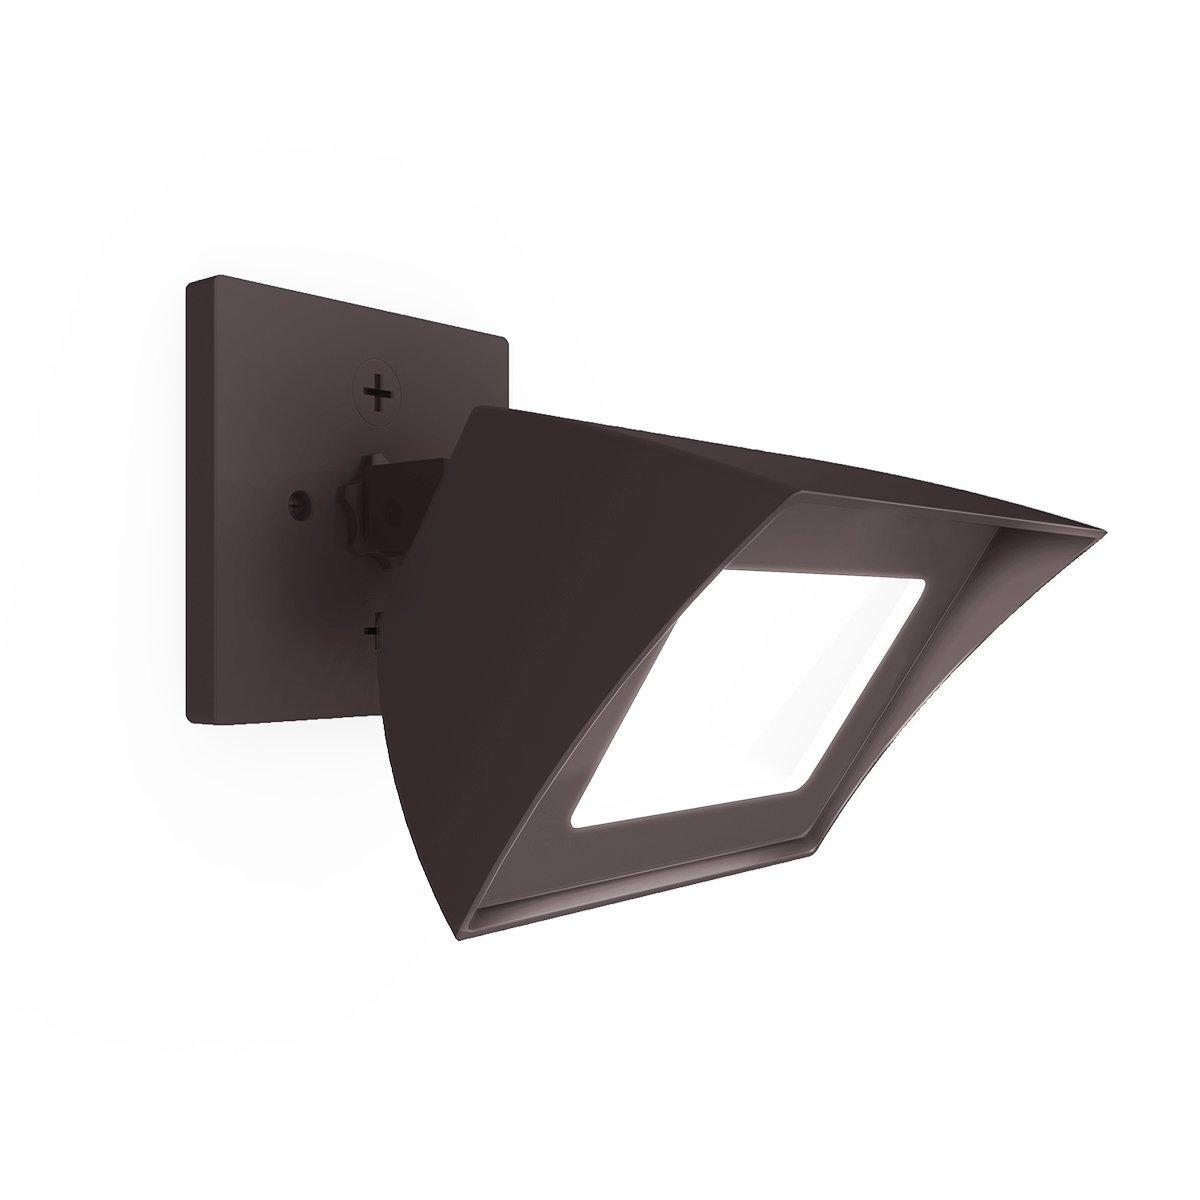 WAC Lighting WP LED335 30 ABZ Contemporary Endurance Flood Light Outdoor/Indoor  Wall Pack     Amazon.com